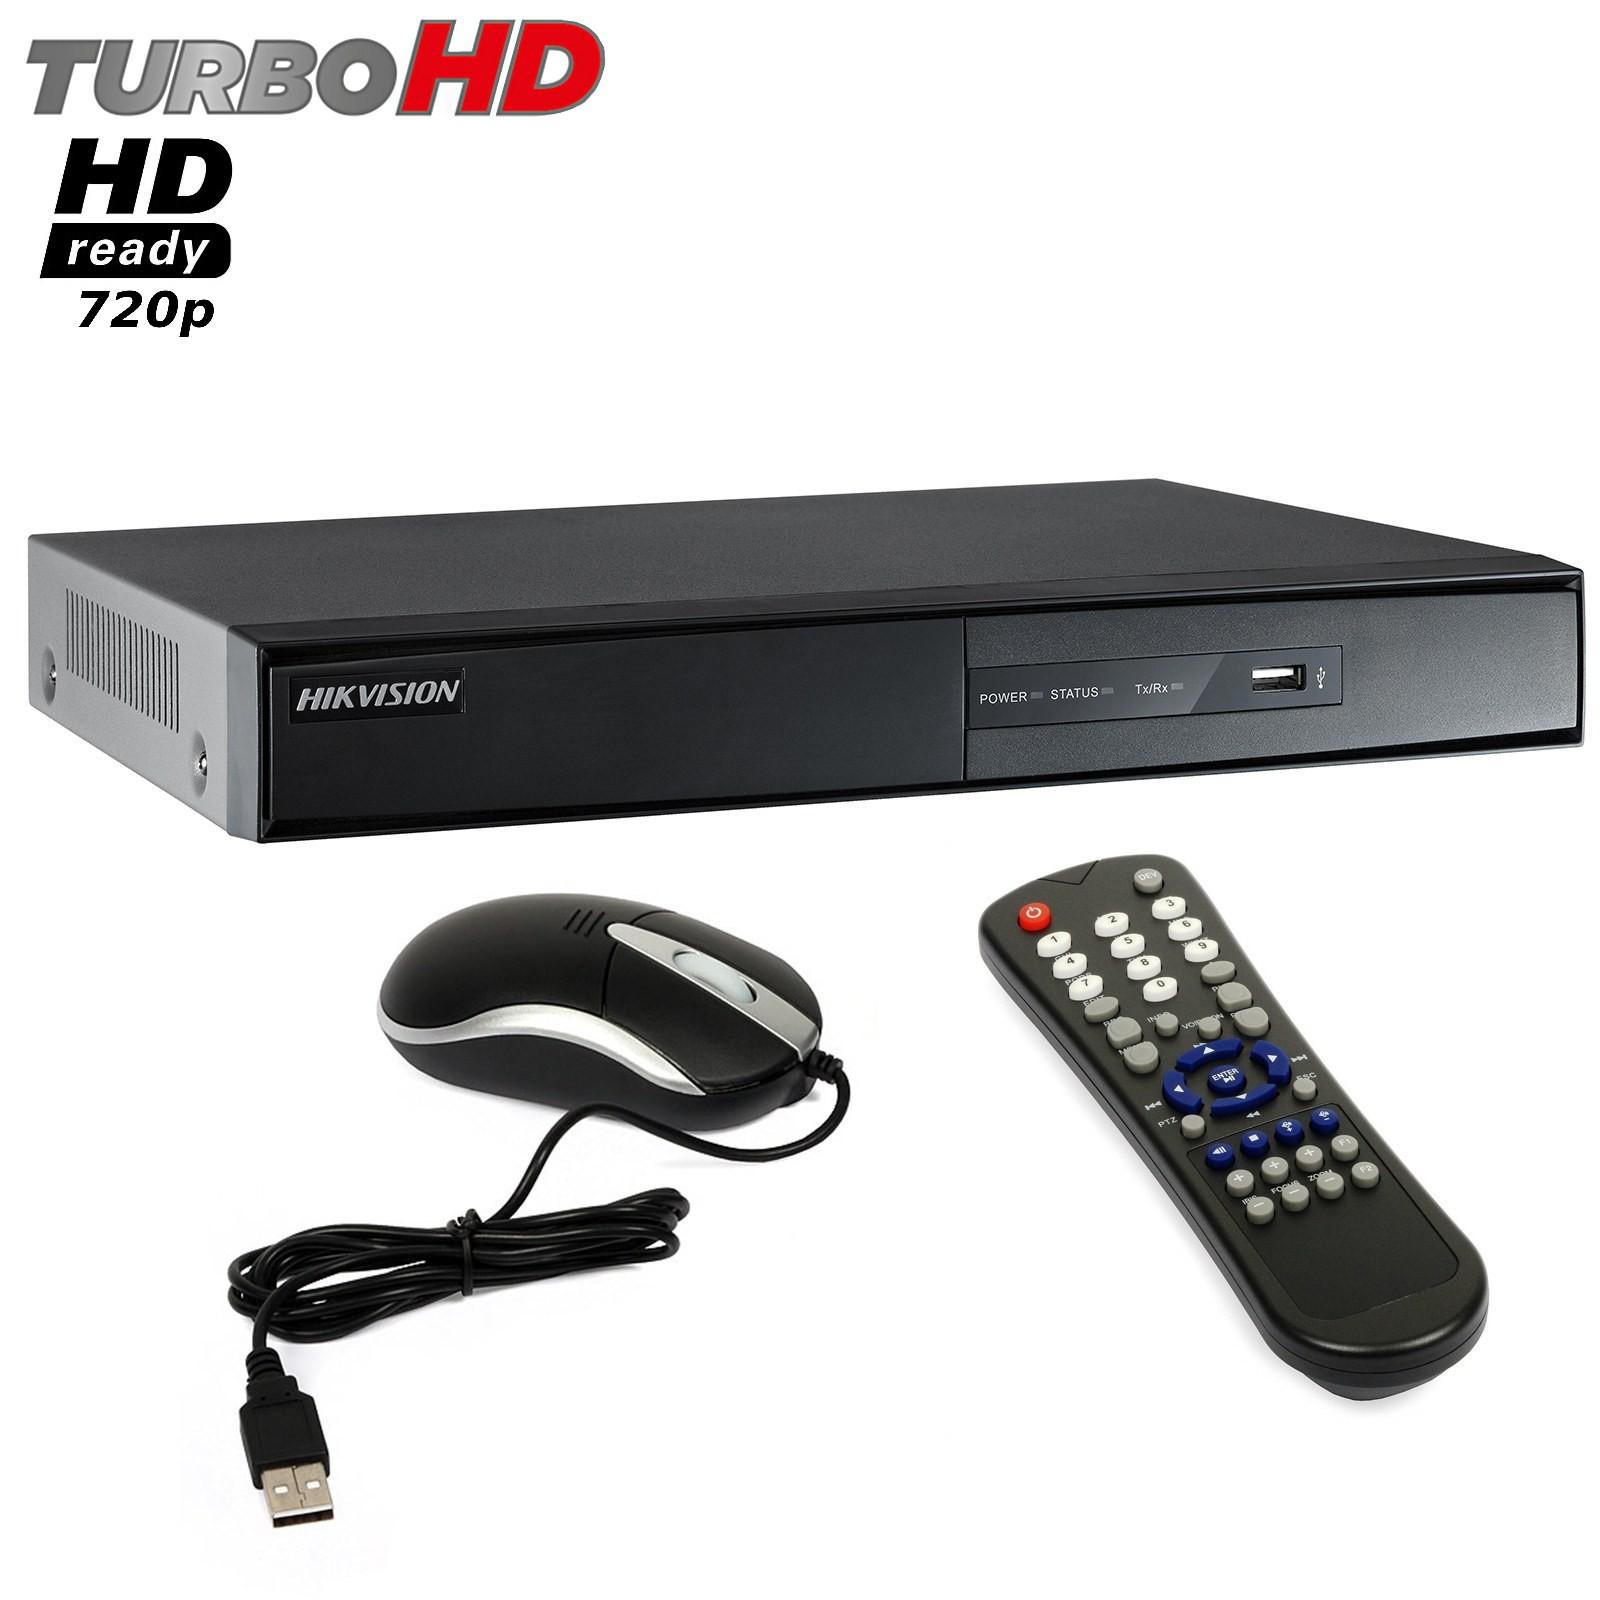 Dvr 16 Canali HIKVISION Turbo HD Ready 720P VGA HDMI H.264 LAN DS-7216HGHI-SH